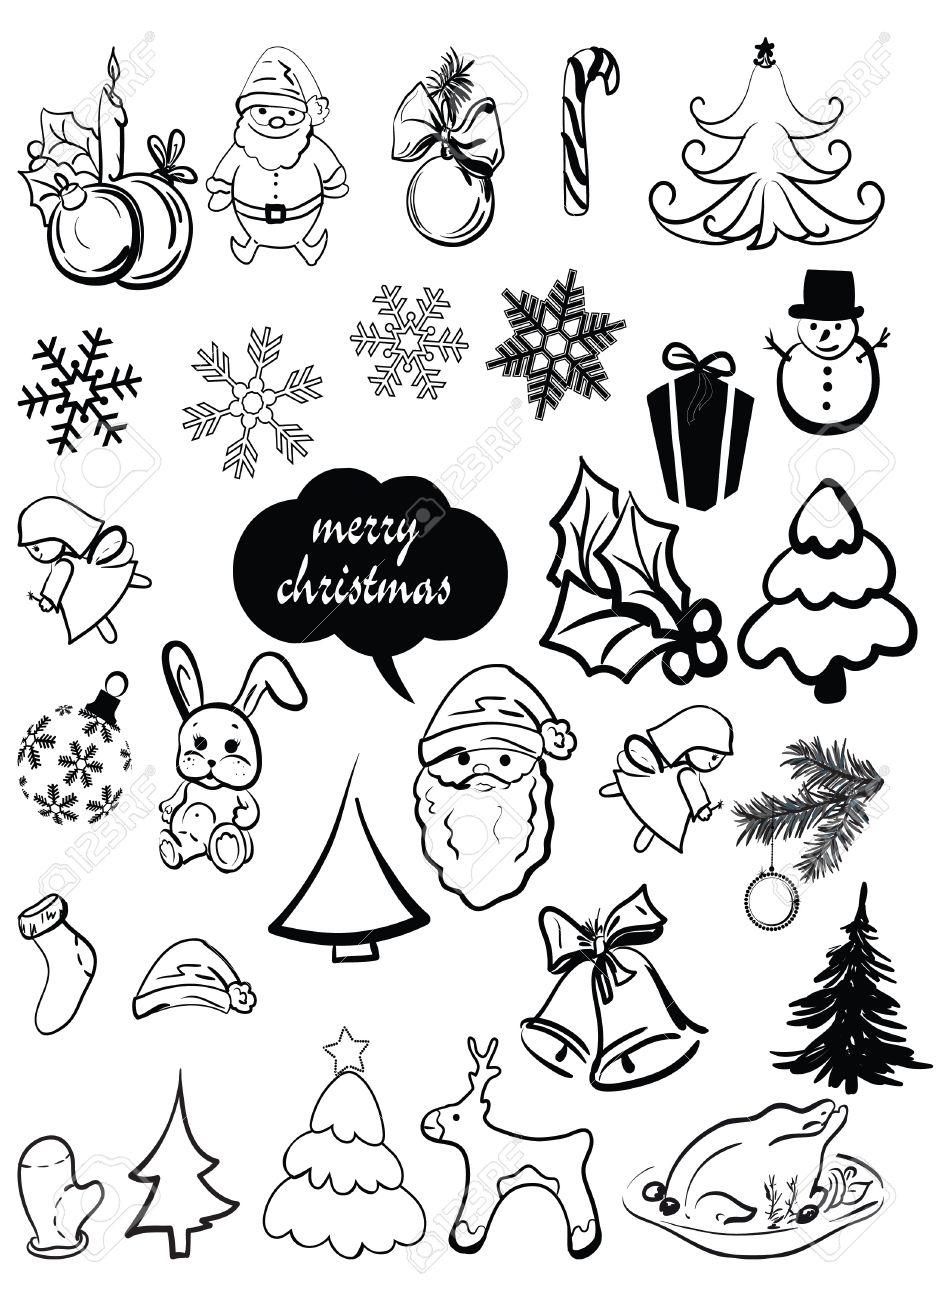 New Year s, Christmas elements, santa, a deer, a sugar candy, caramel, a sweet, a fir-tree, a snowflake, etc Stock Vector - 12429946